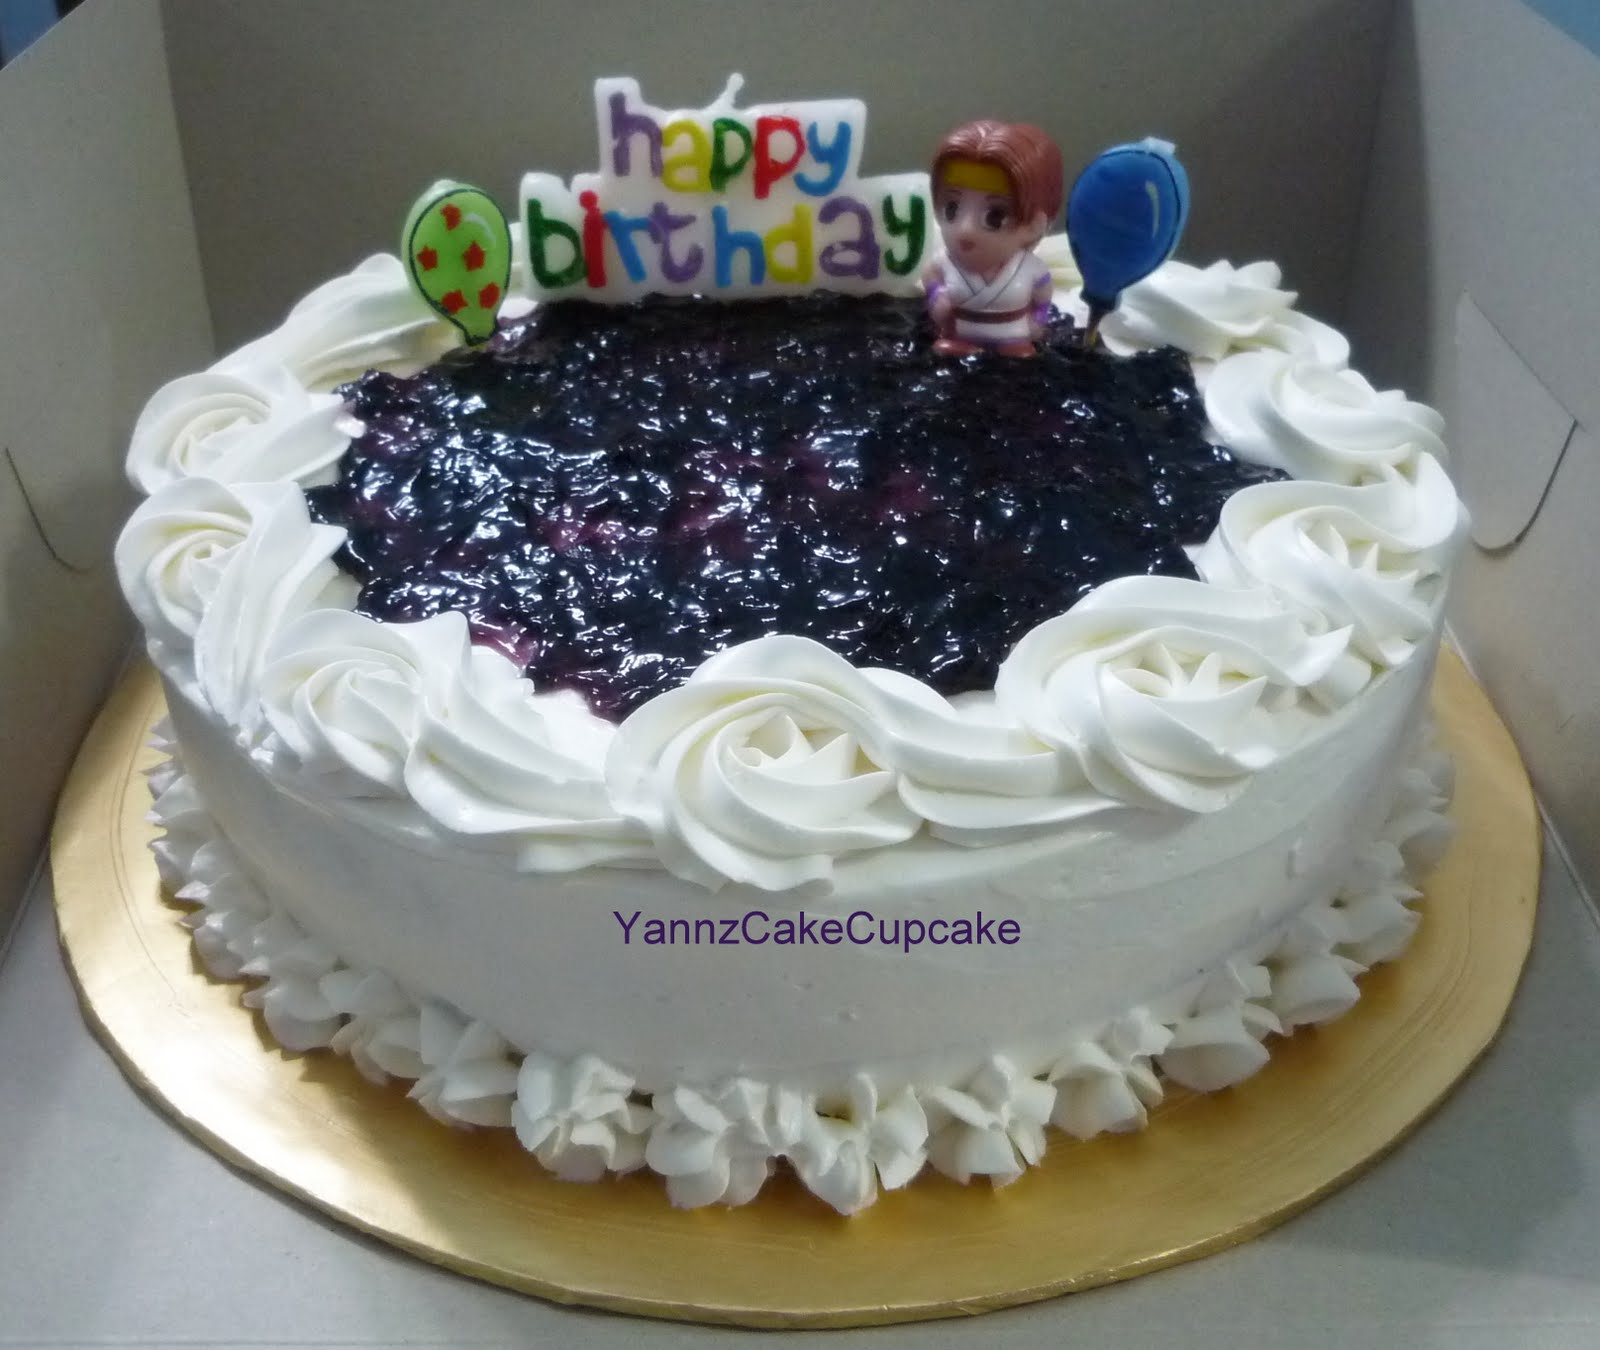 Birthday Cake For Brother Birthday cake